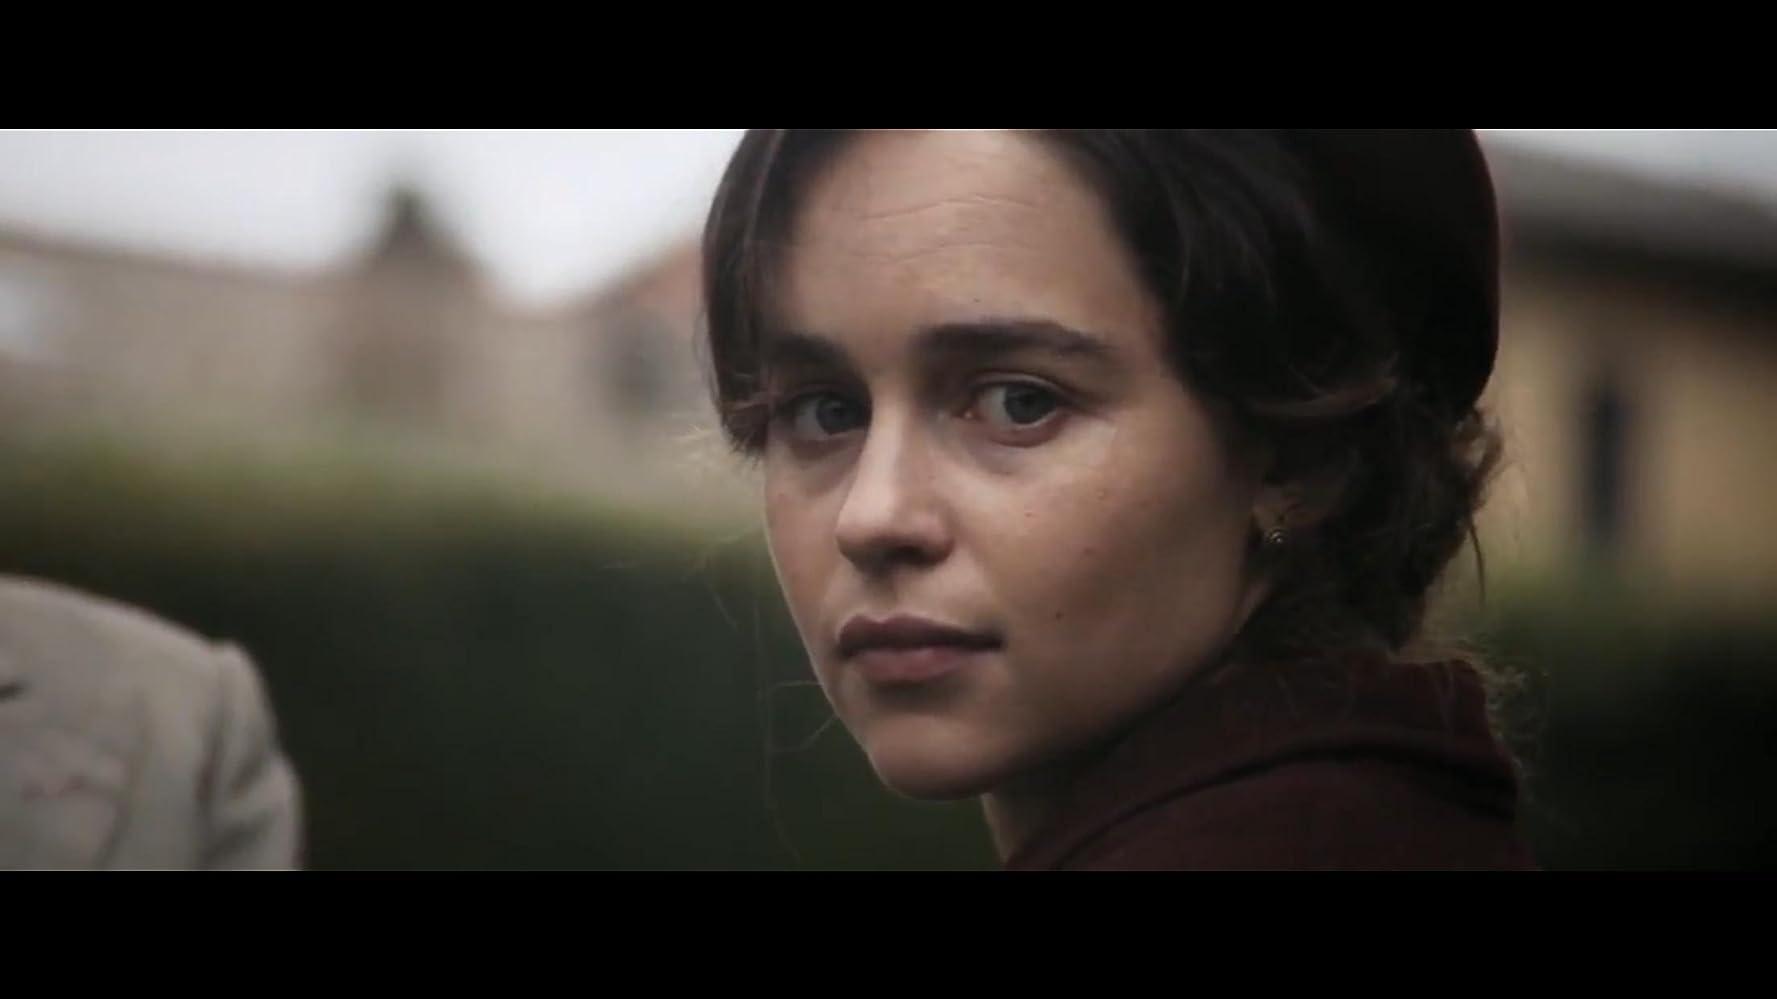 تحميل ومشاهدة فيلم Voice from the Stone 2017 720p BluRay مترجم